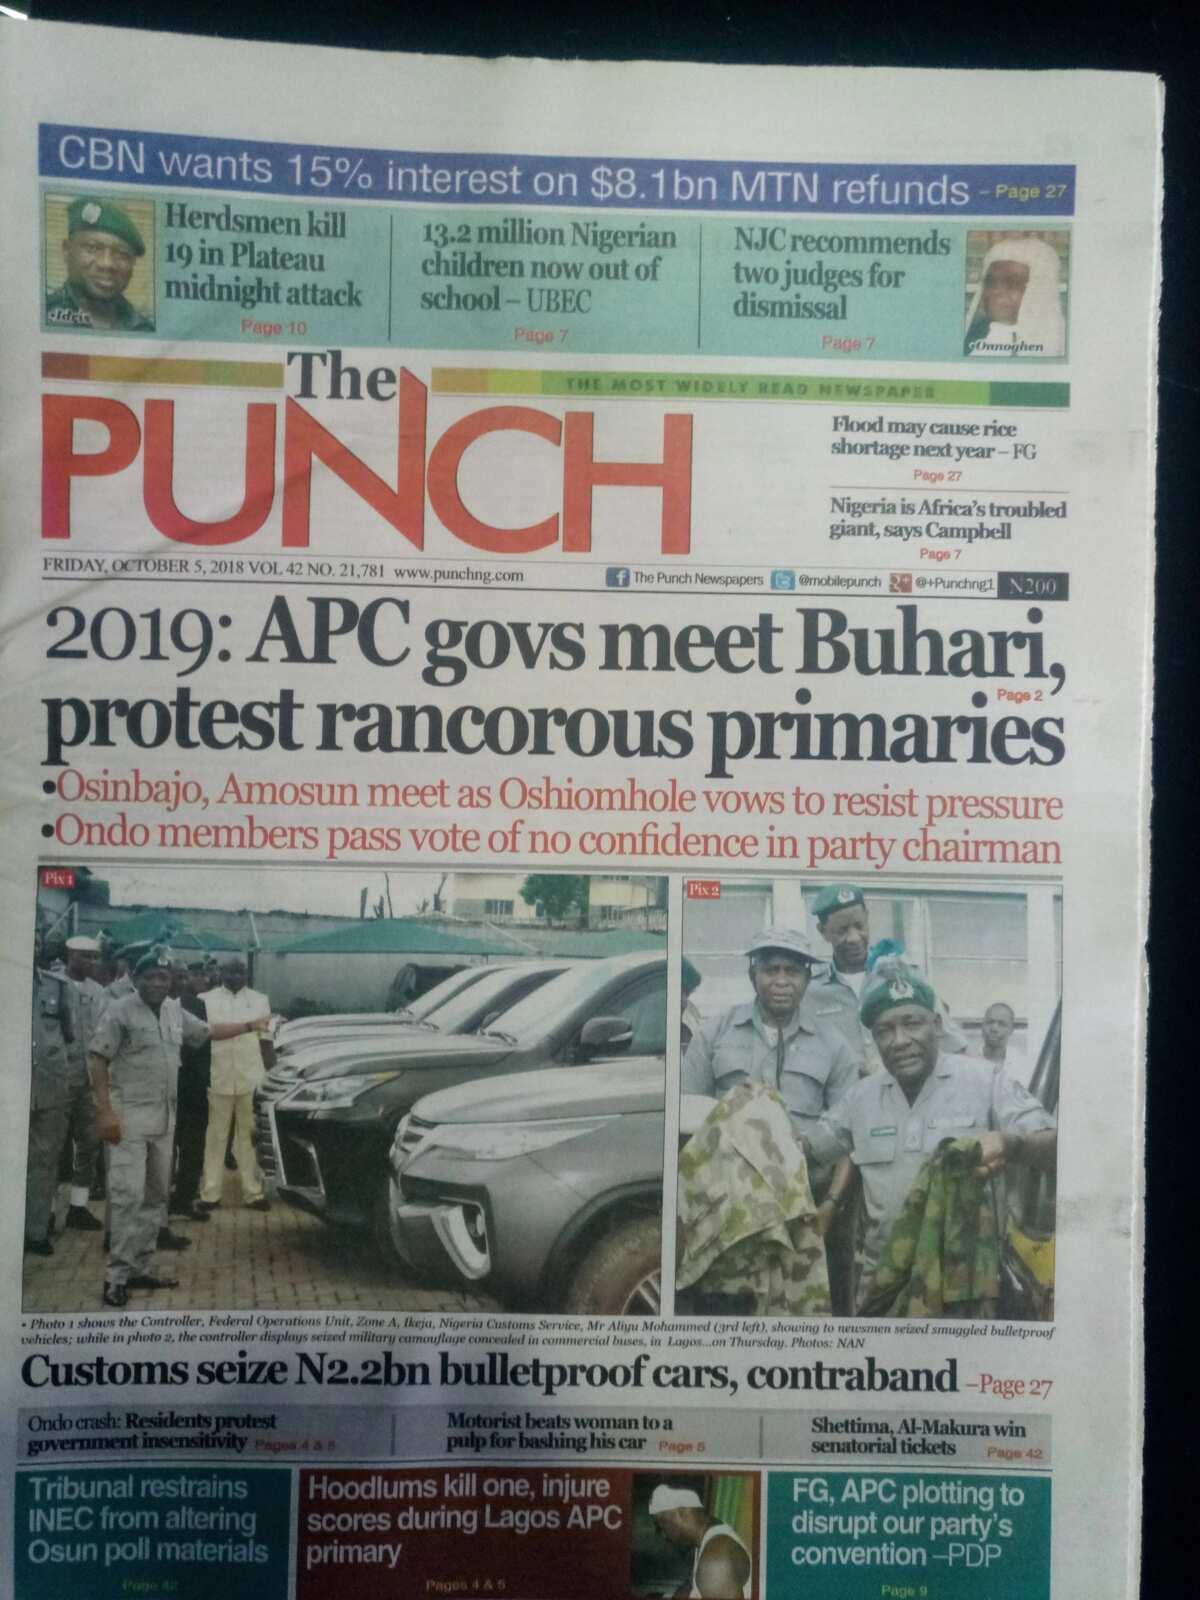 2019: APC governors meet Buhari over conduct of primaries (Newspaper Review)